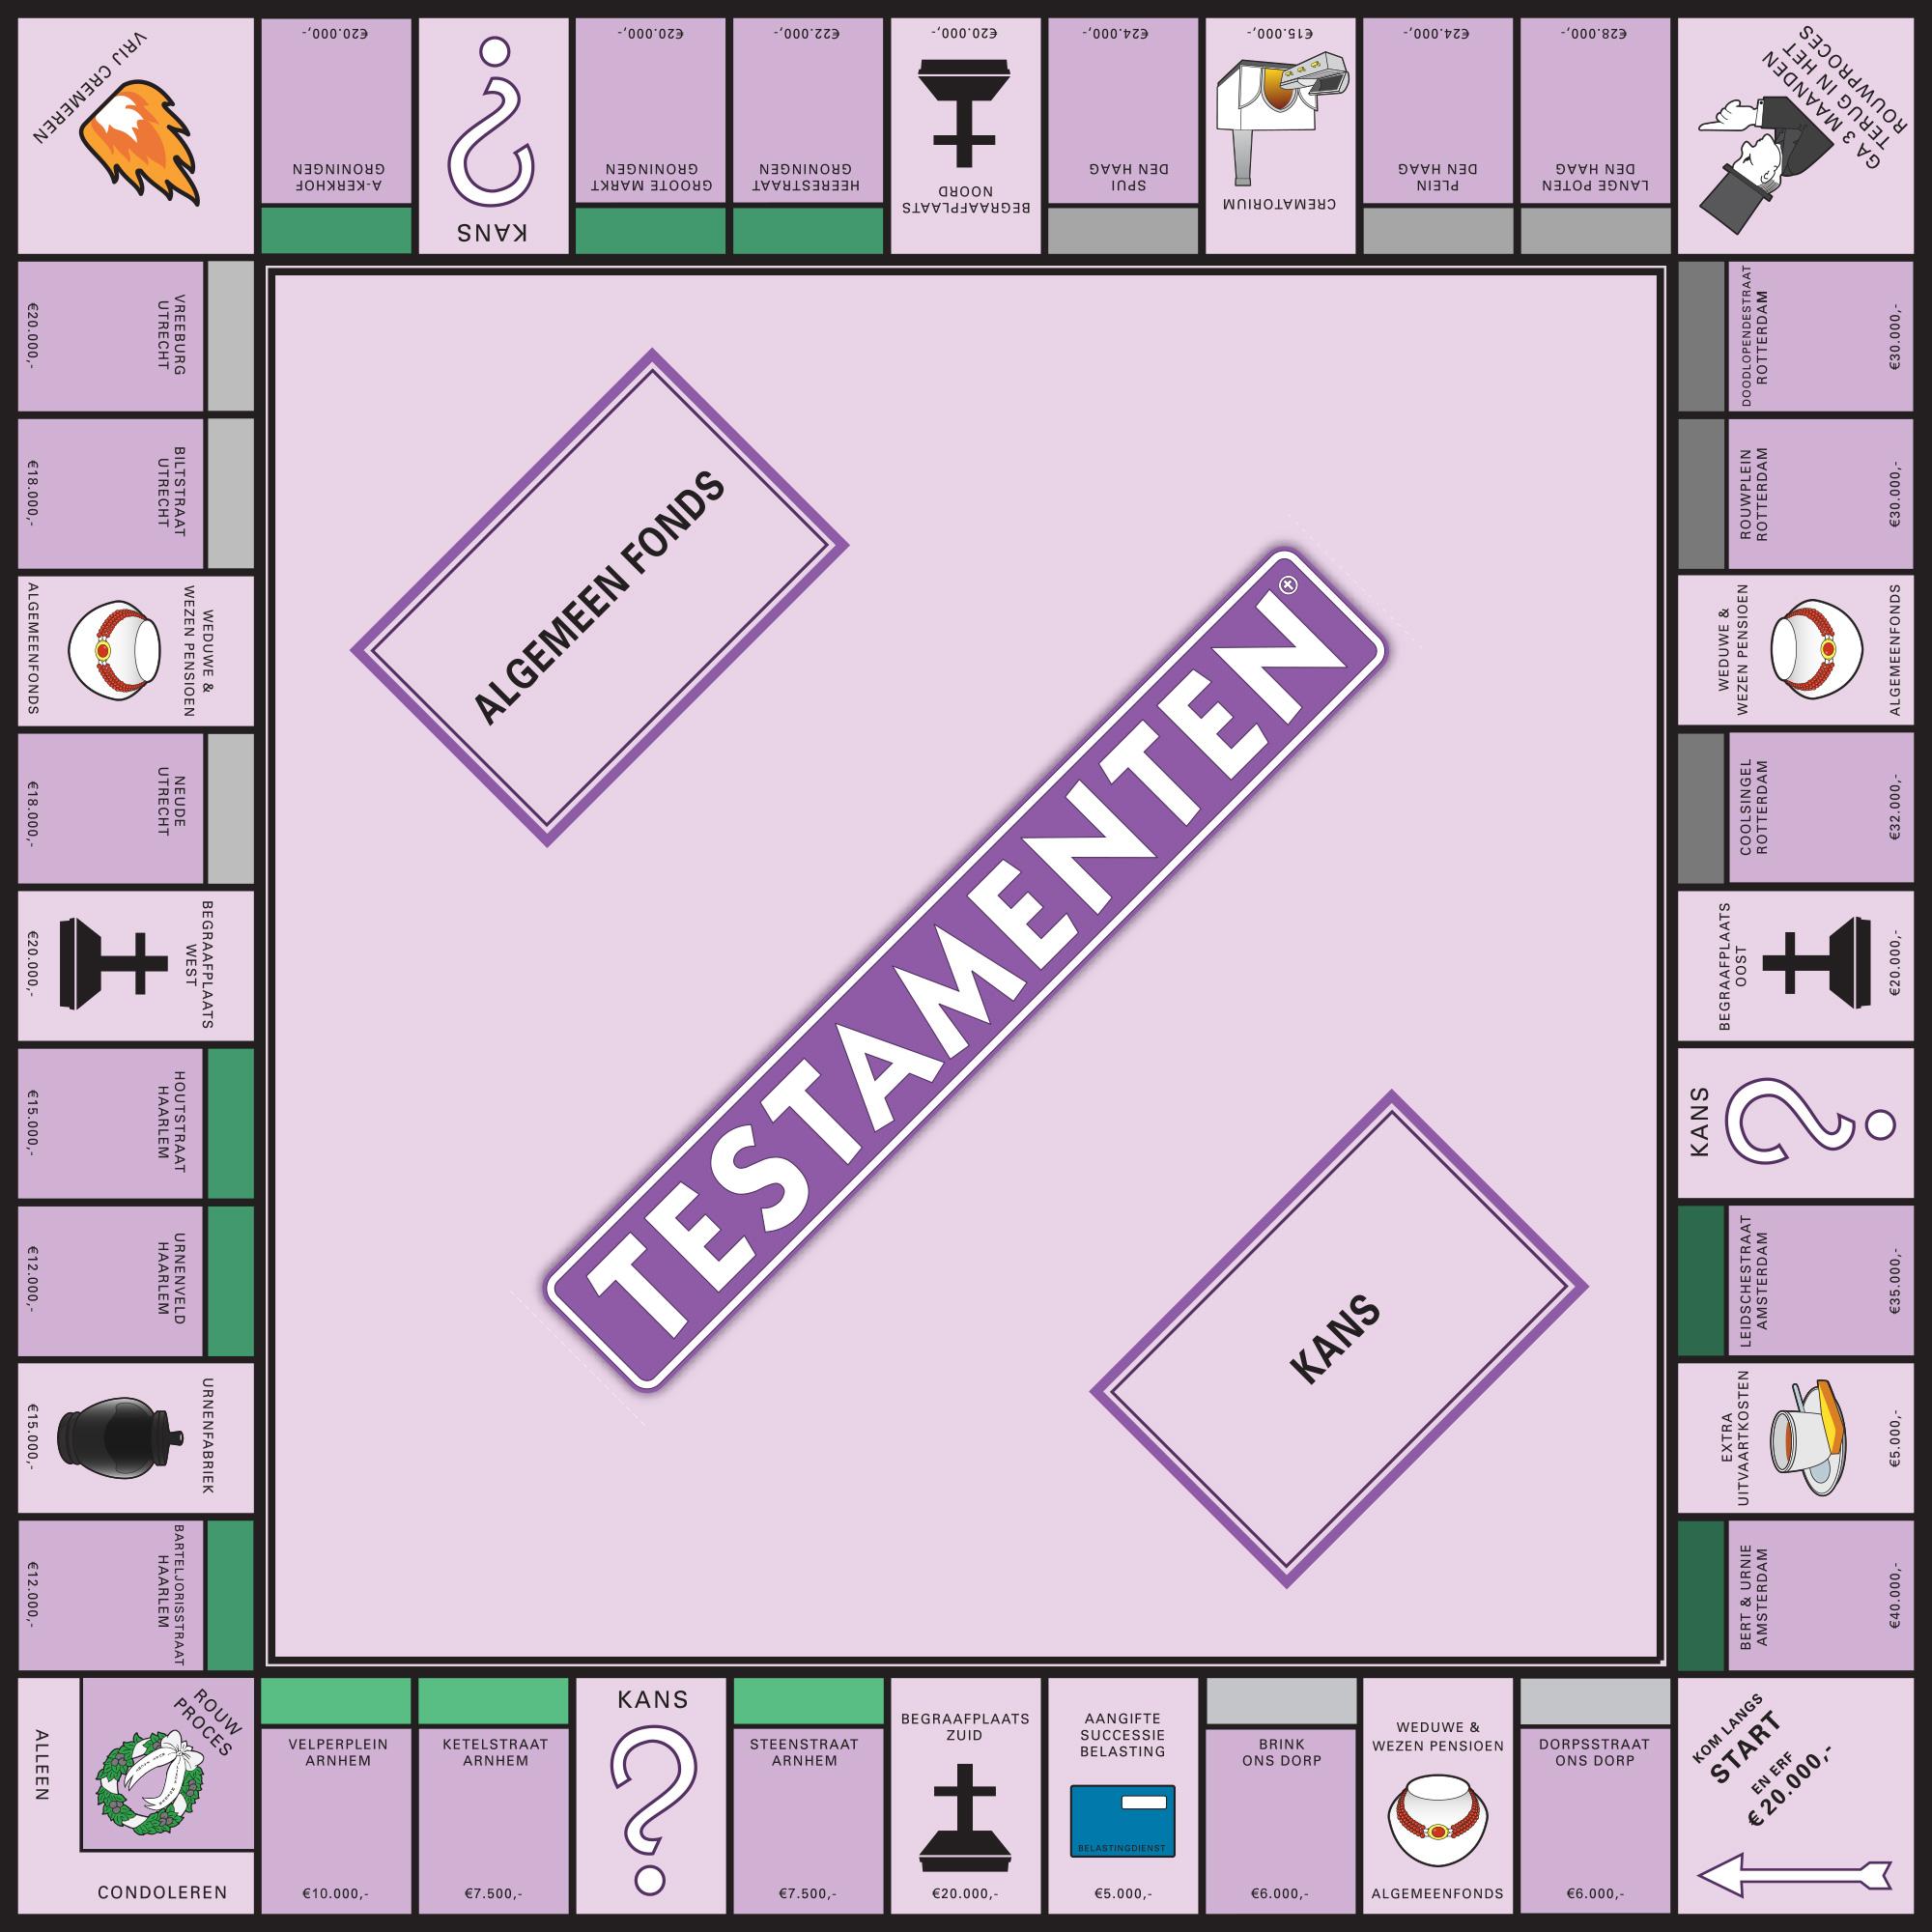 Koefnoen - Game of inheritance board - Testamentenspel bord